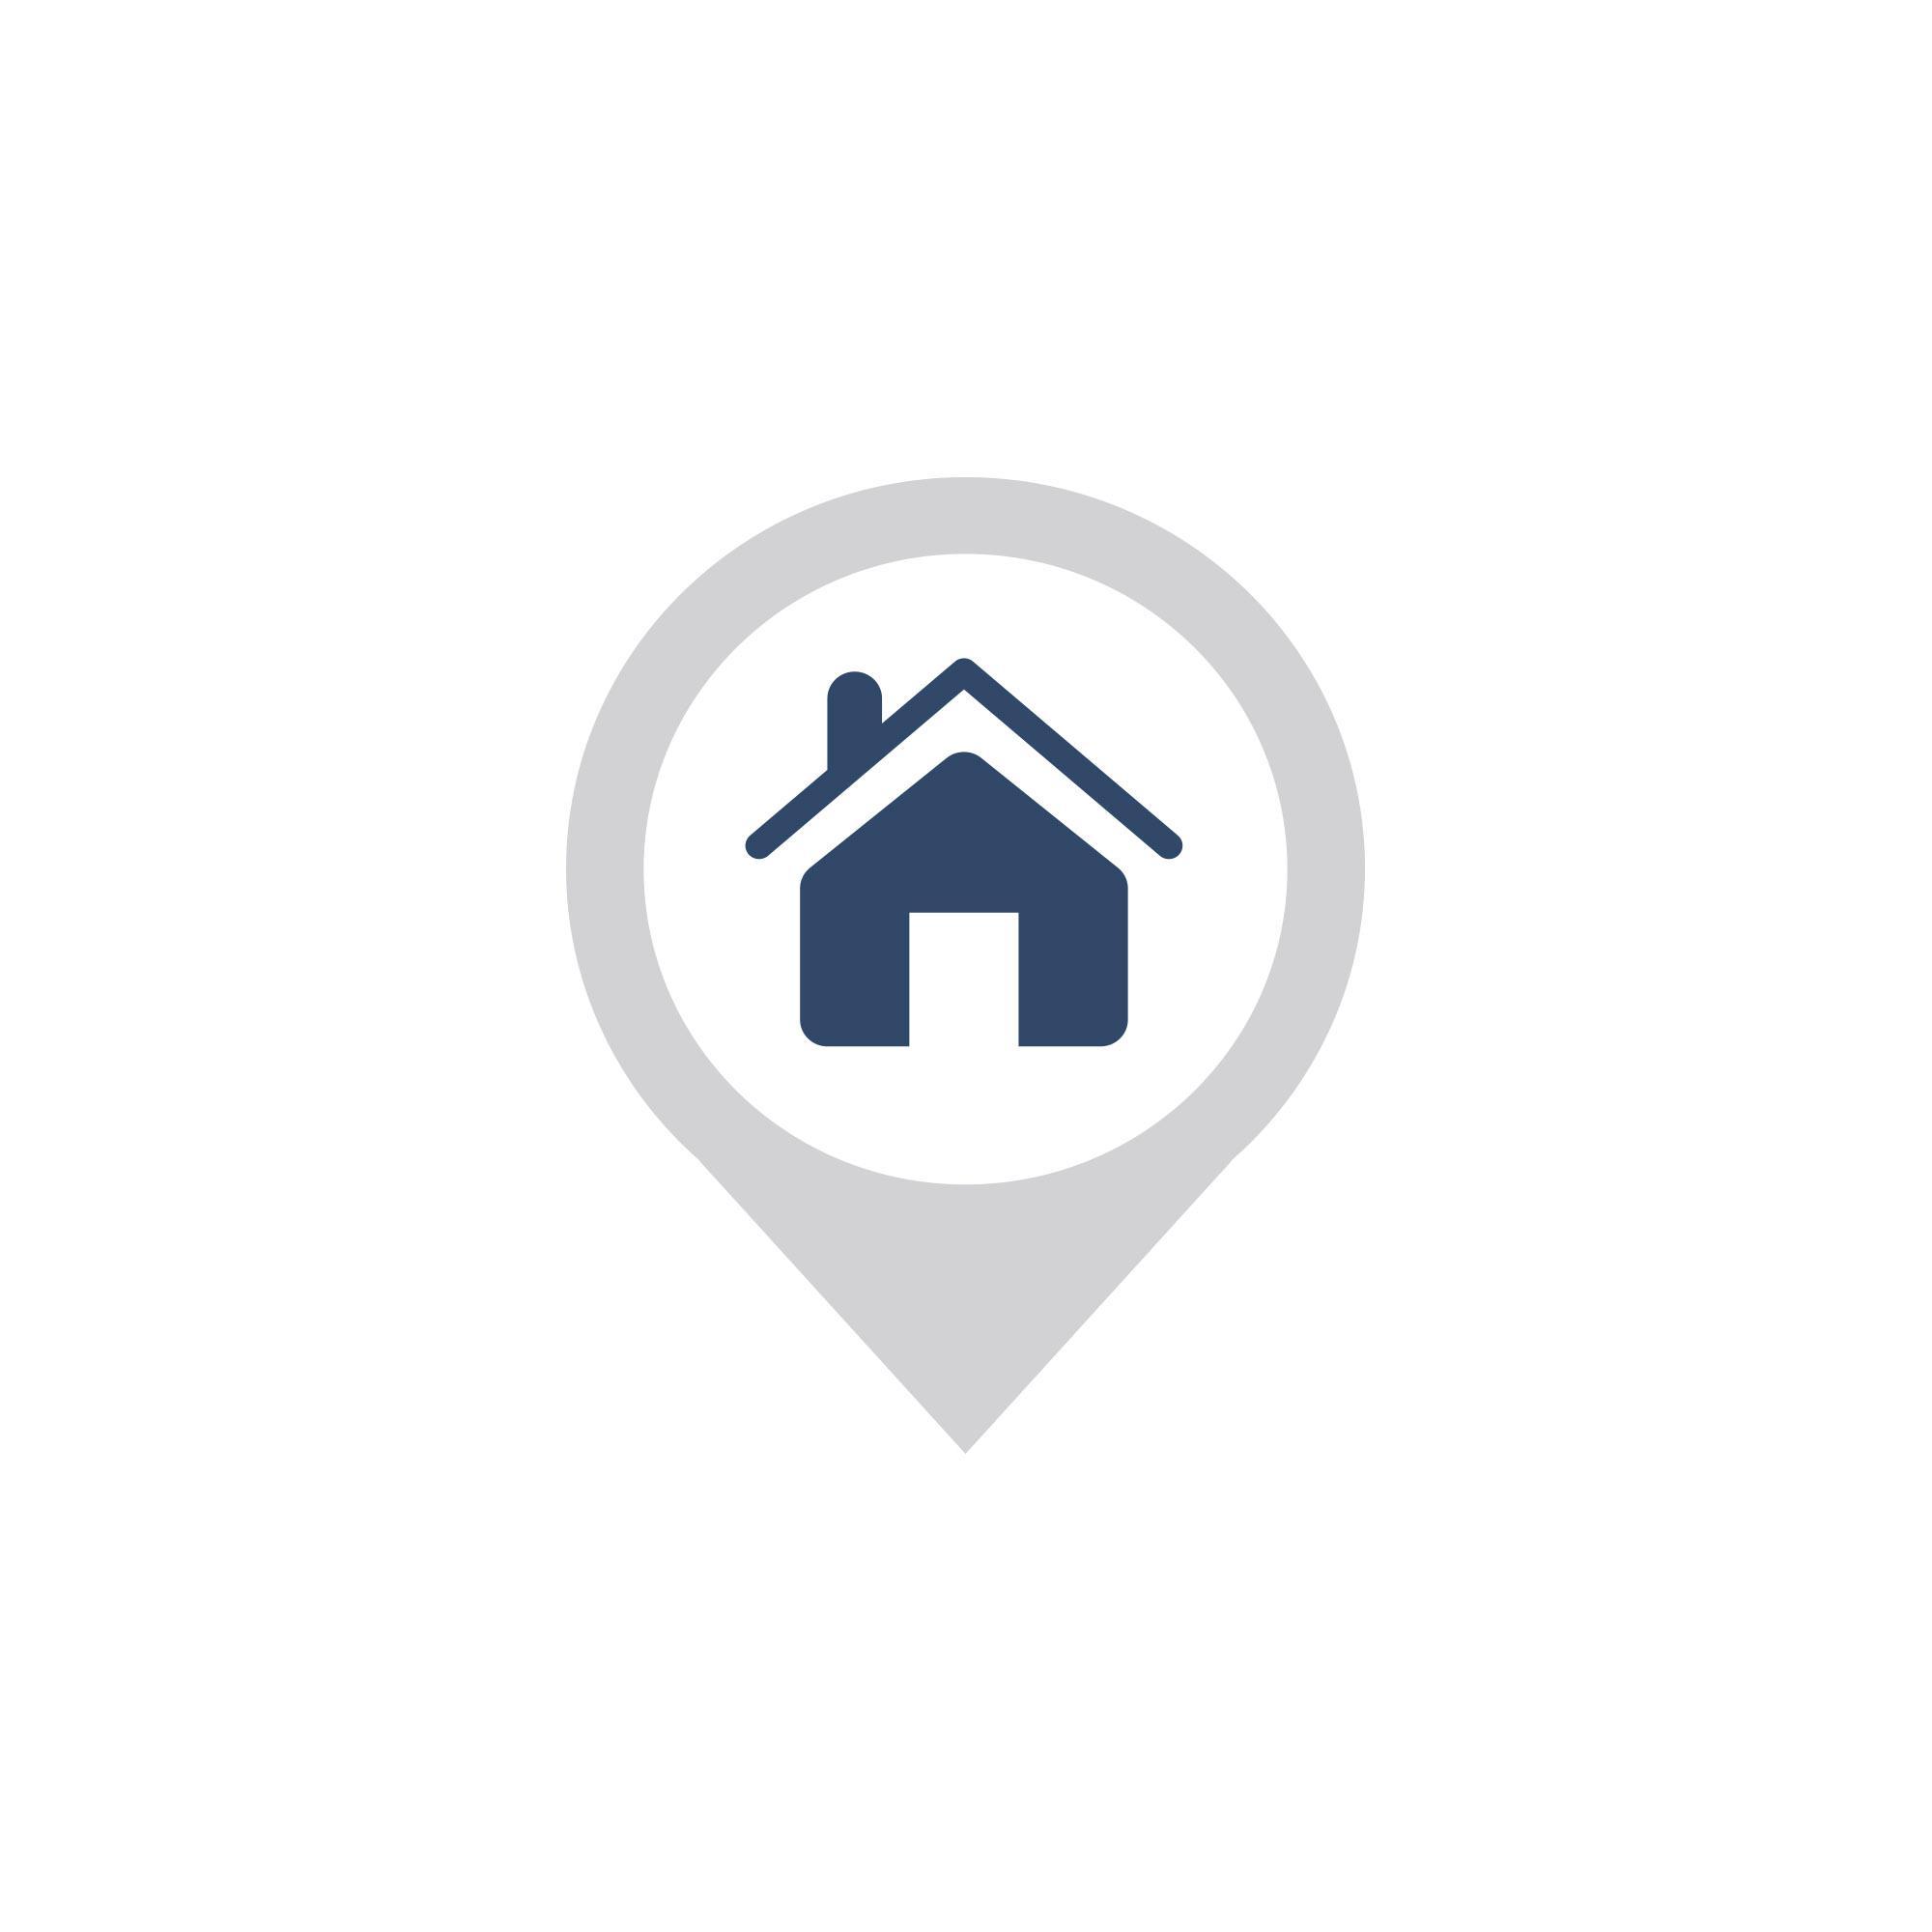 Image de l'agence Home Select - Chasseur Immobilier